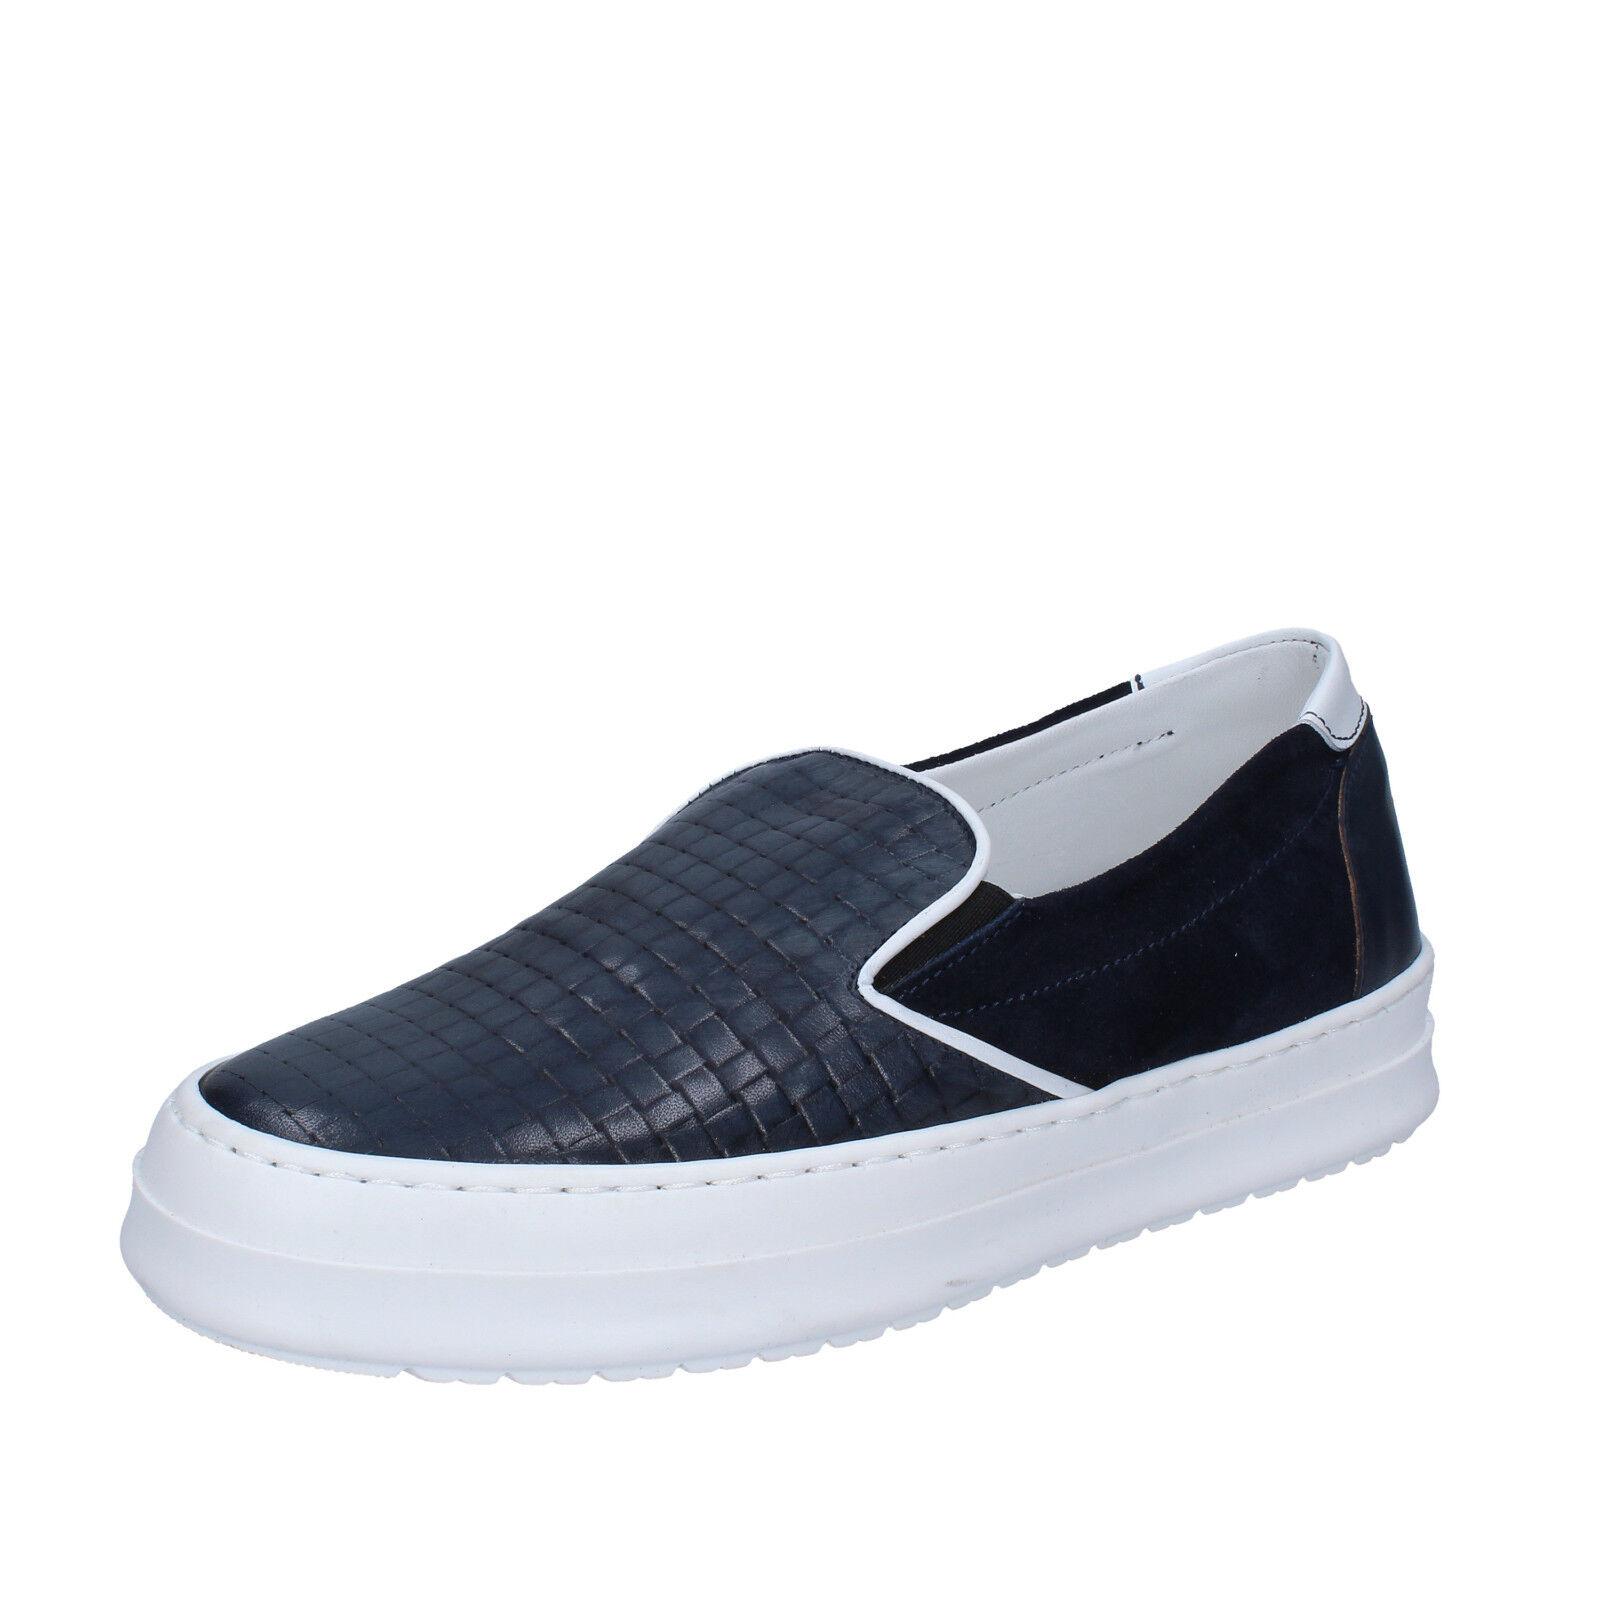 Scarpe casual da uomo  Scarpe uomo FDF shoes 42 UE Mocassini Slip-on blu pelle camoscio bz341-c